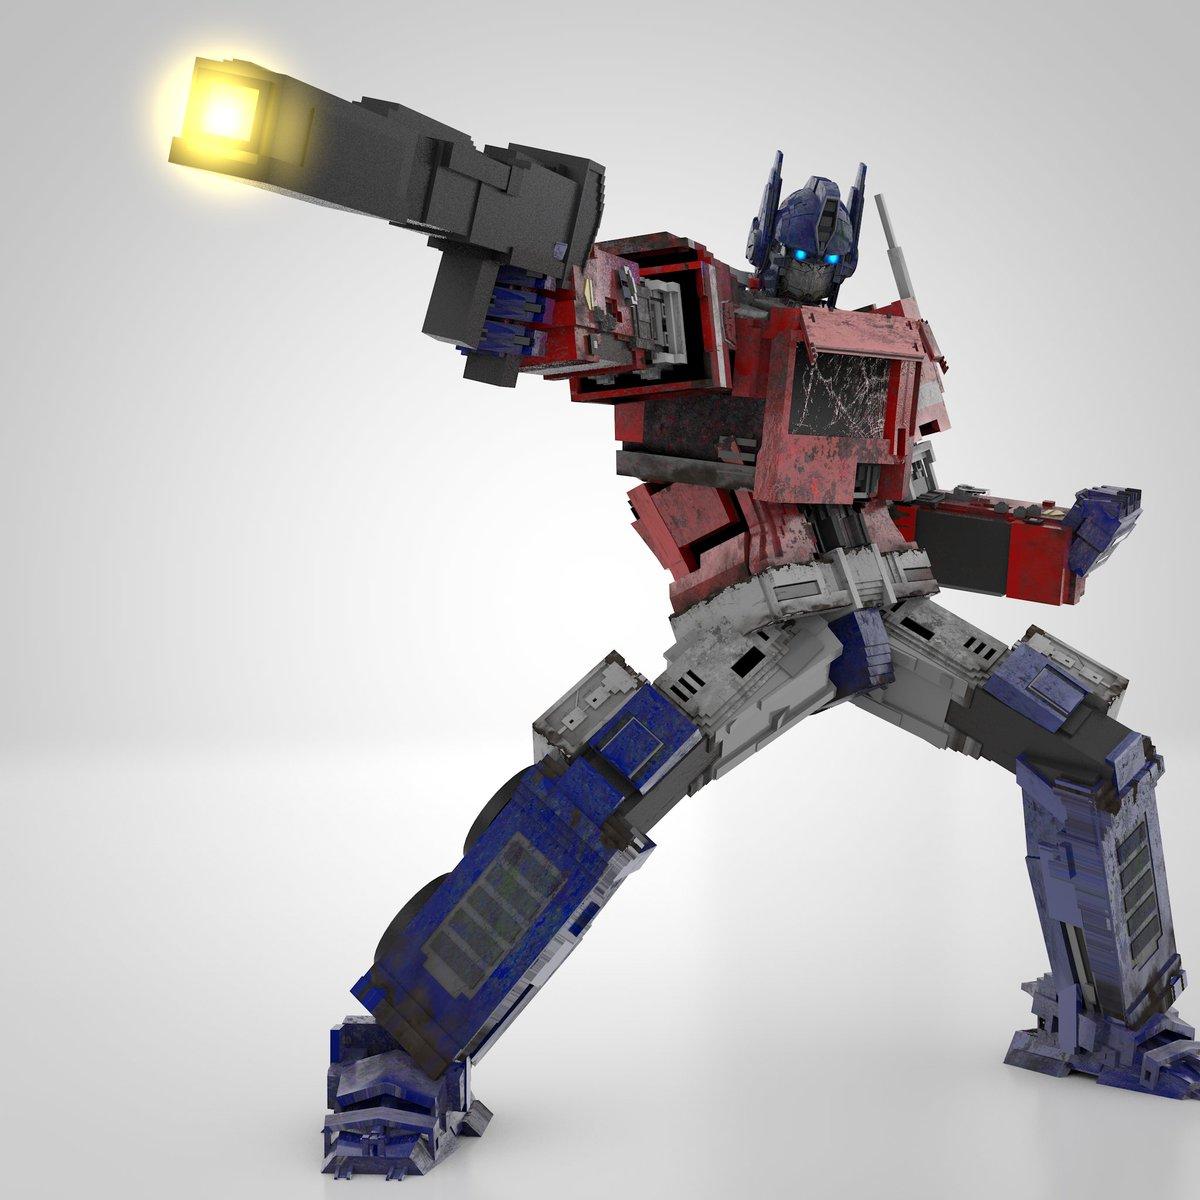 The great buddha, version 2021 (Optimus Prime obviously)  #optimusprime #transformers #autobots #bumblebeemovie #cinema4d #3dmodel #megatron #decepticons